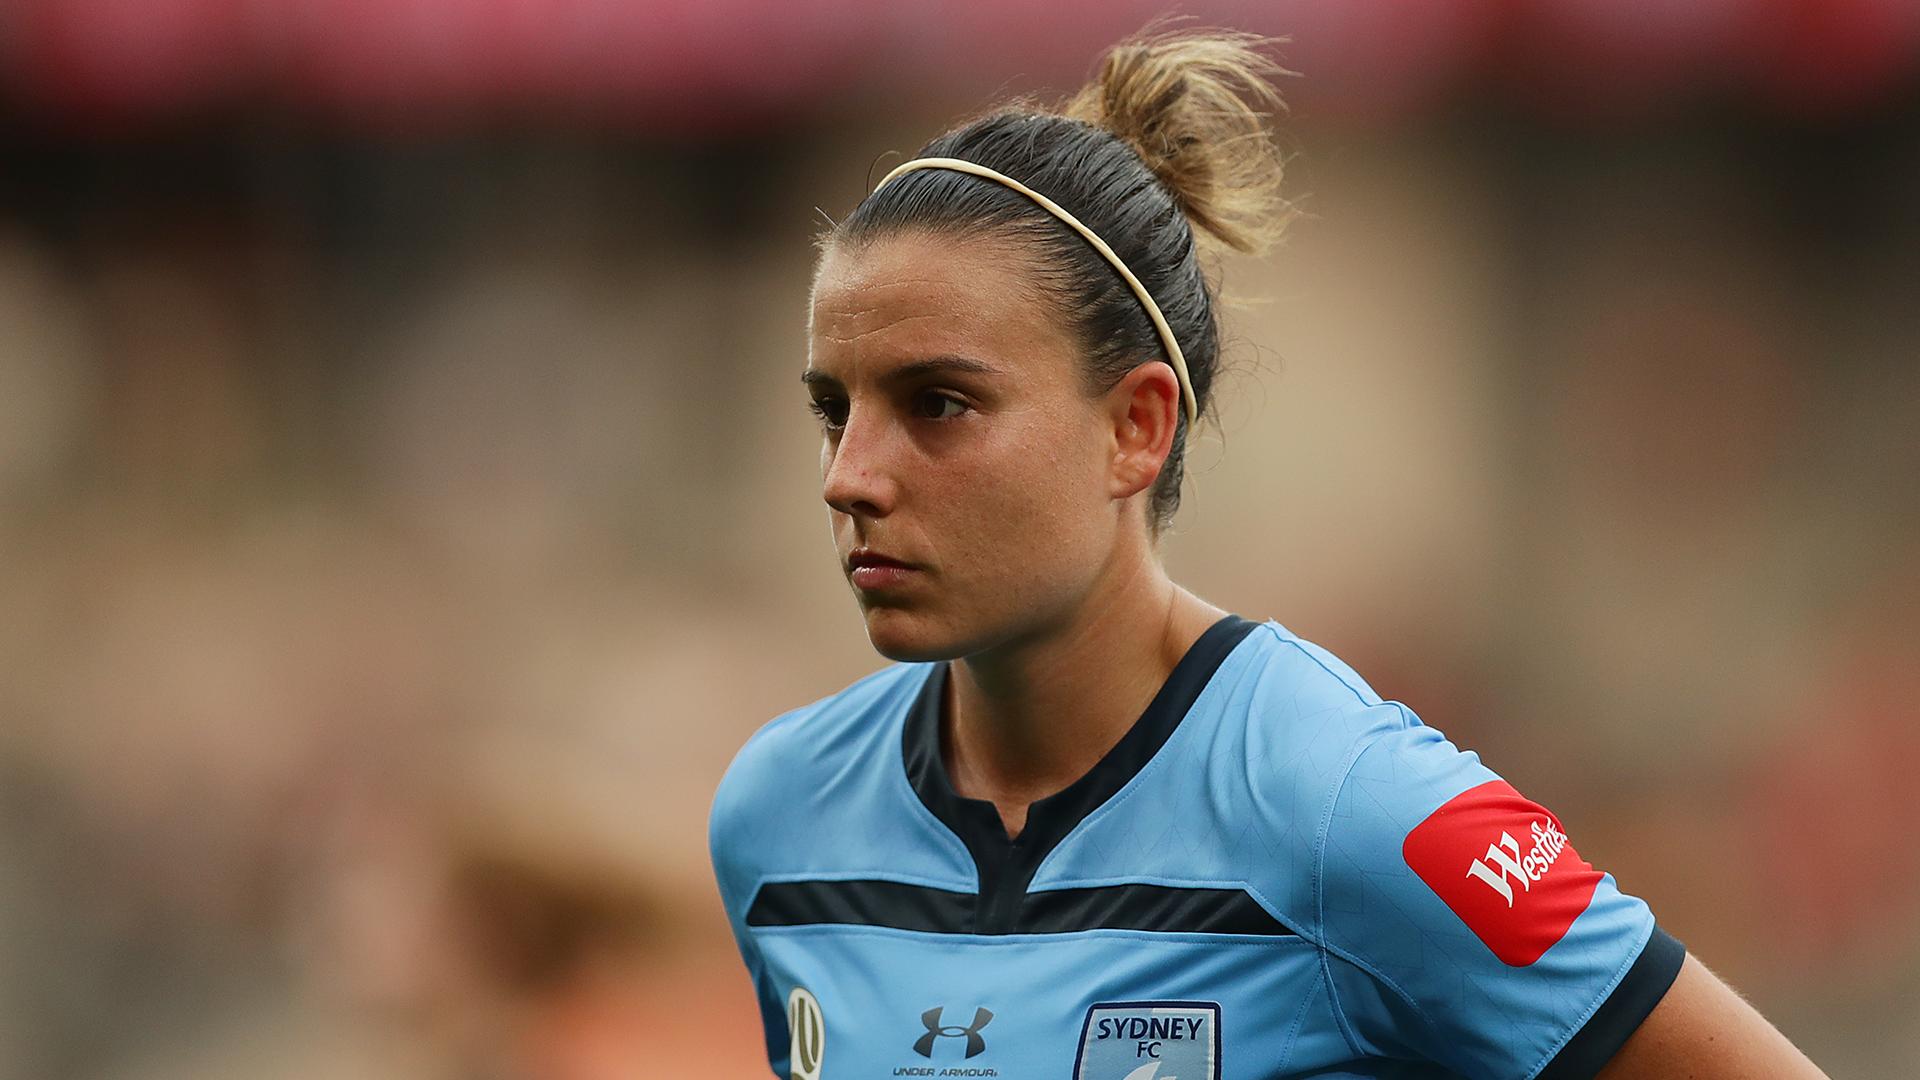 A-League and Australian football news LIVE: Logarzo latest Matilda to make England move